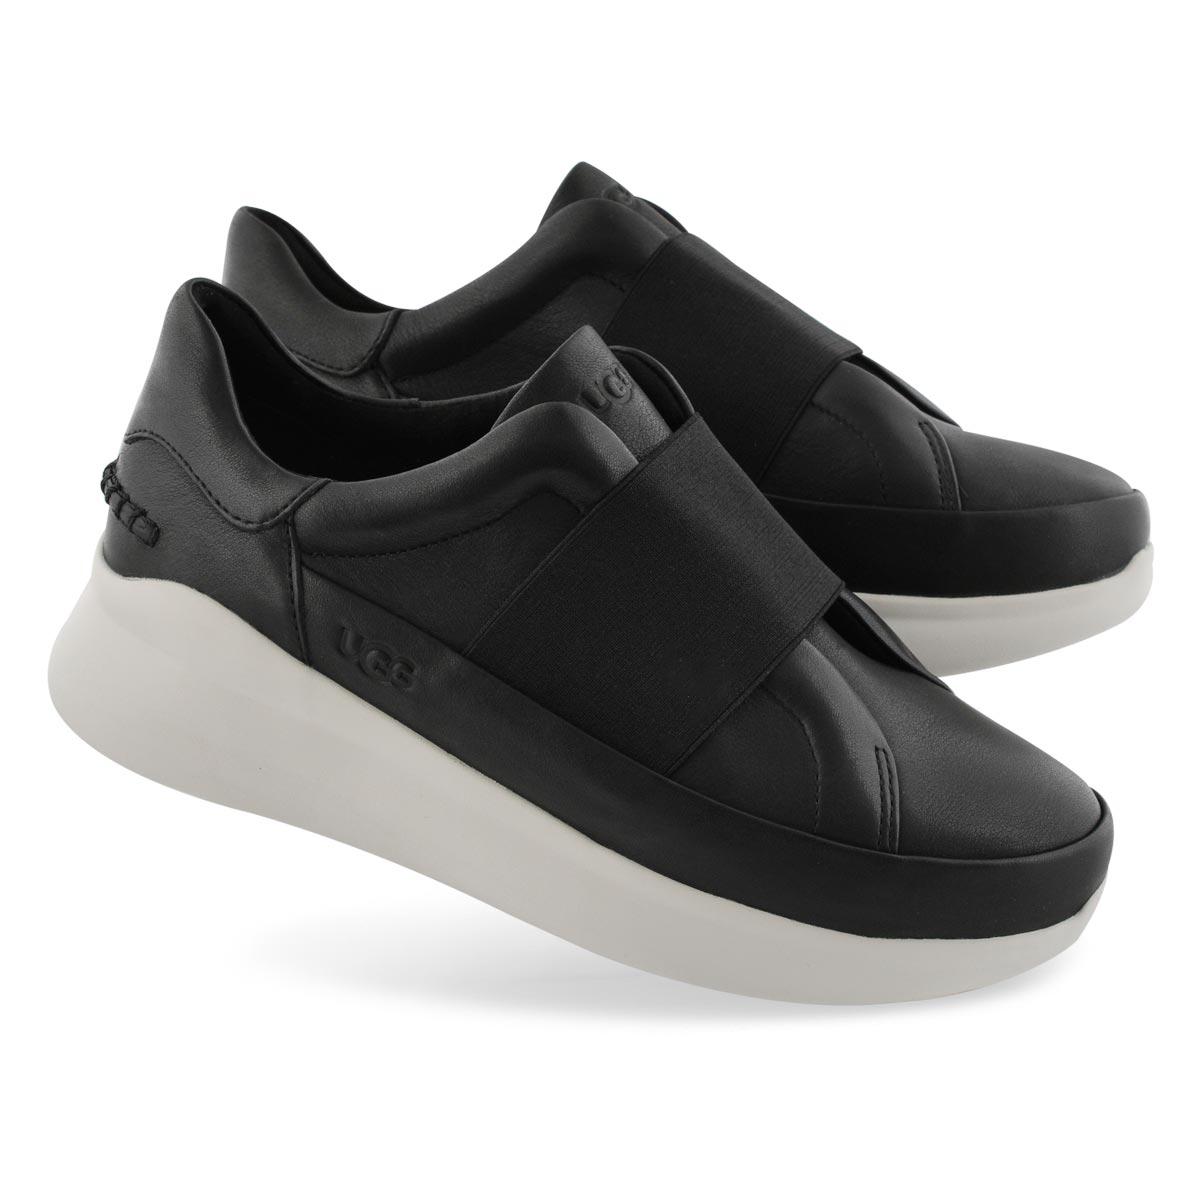 Women's LIBU black slip on sneakers